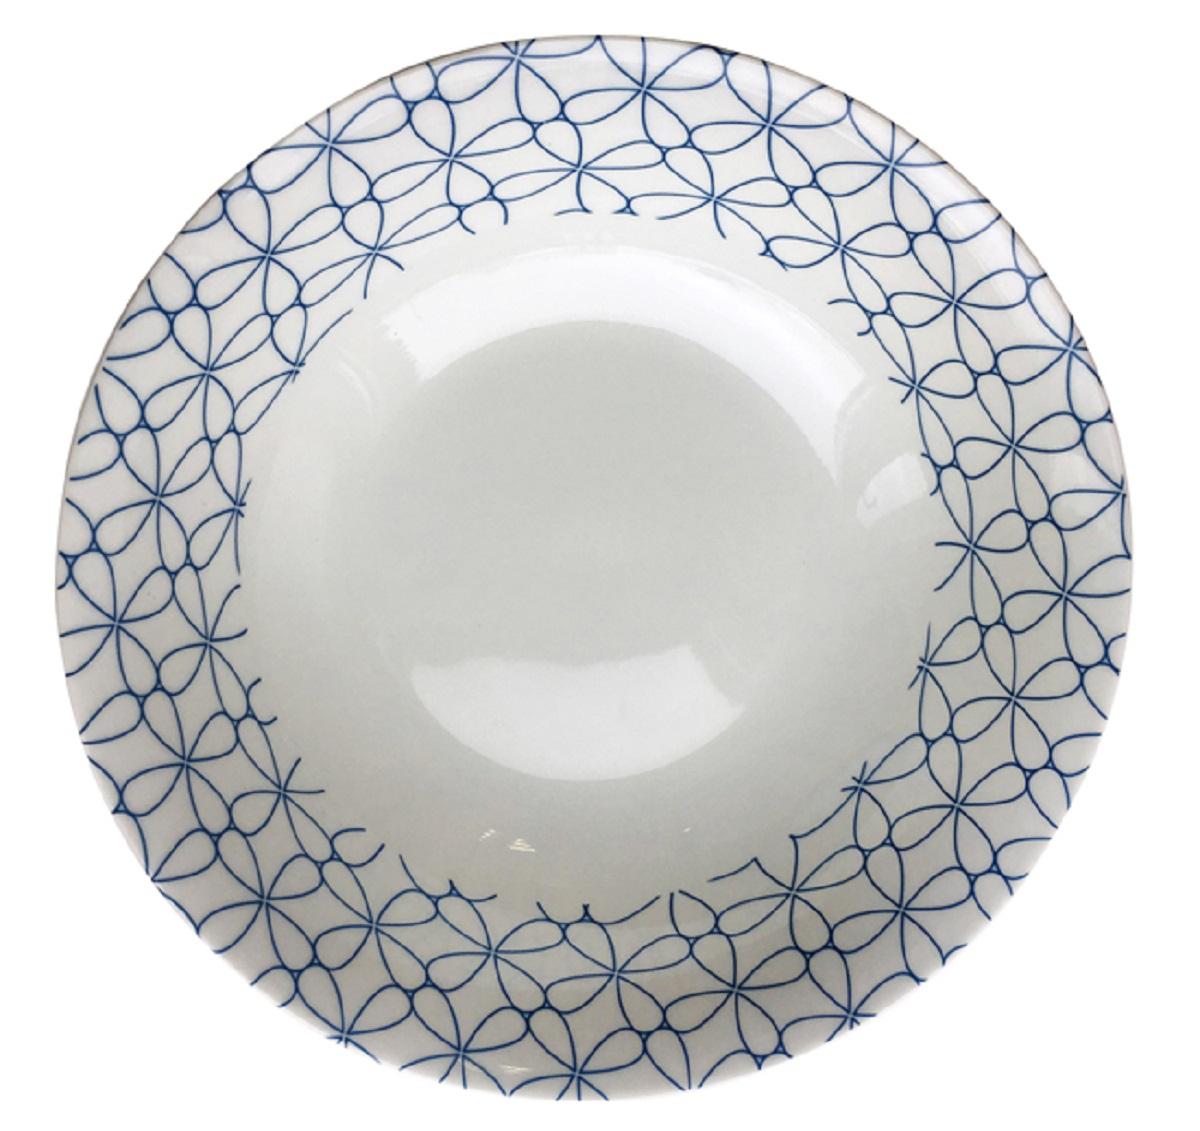 Тарелка суповая МФК-профит Белла, диаметр 18 см тарелка суповая фиц строуберри диаметр 20 см 897824